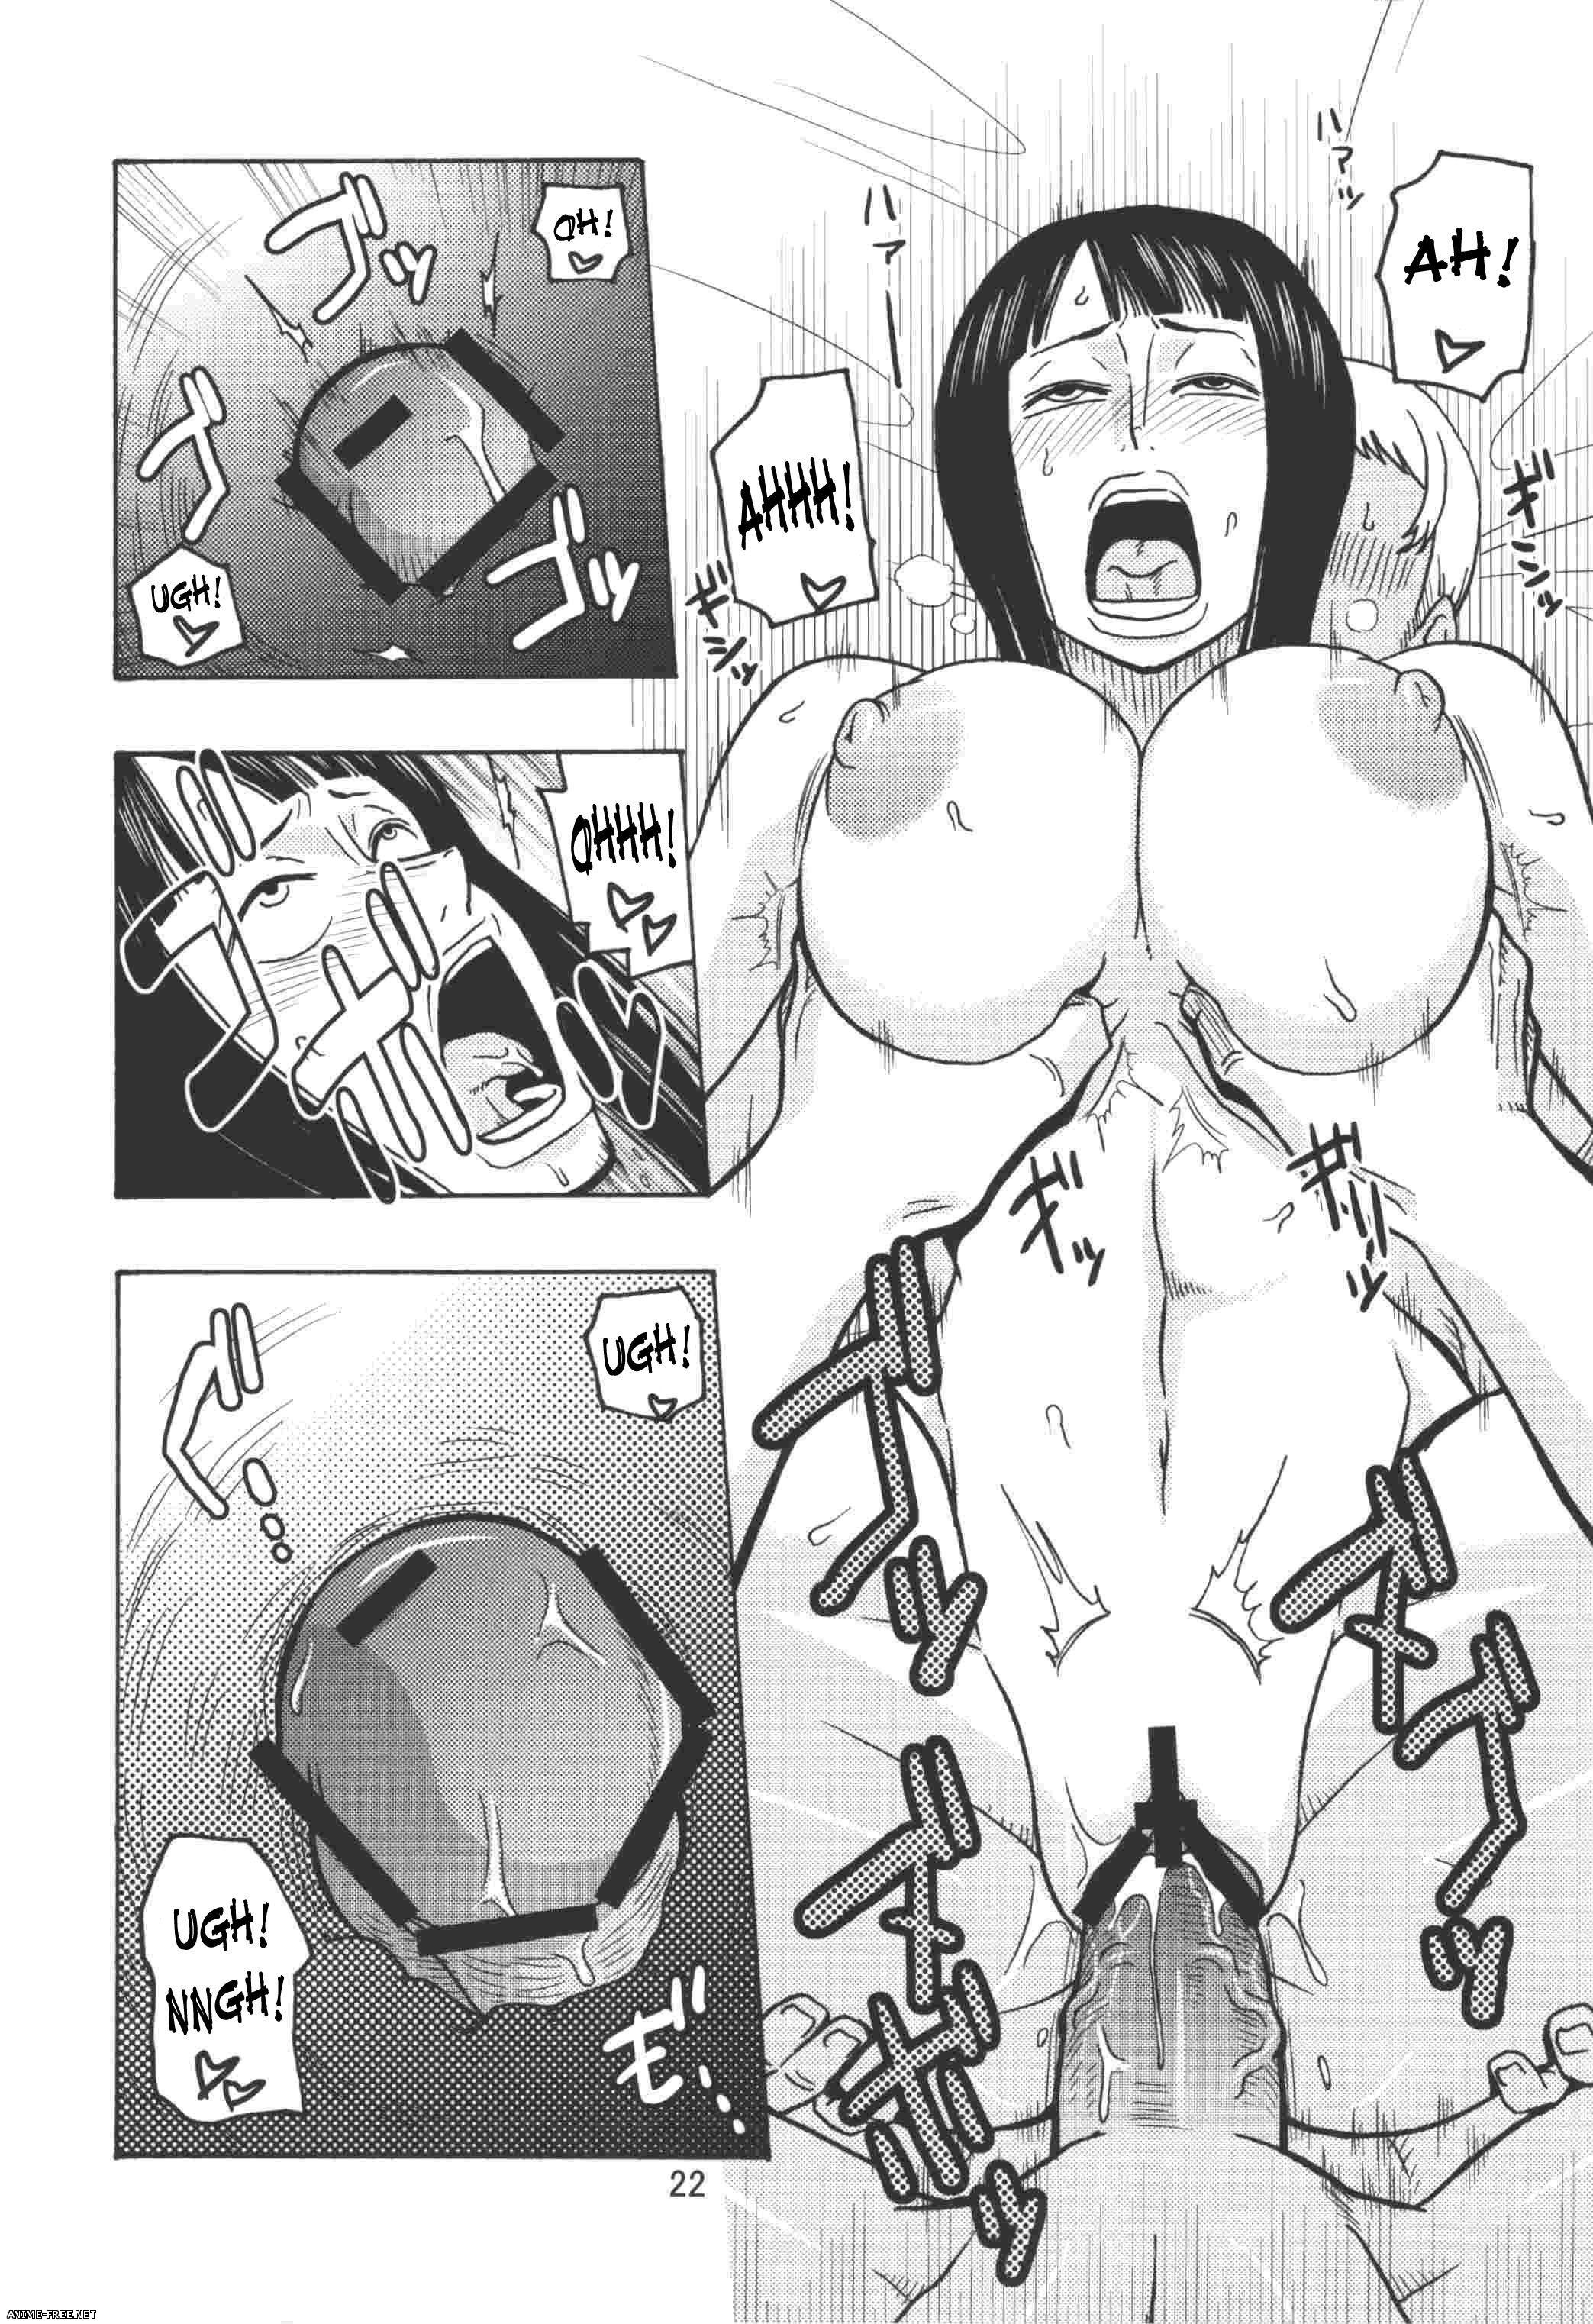 Murata / ACID-HEAD — Сборник хентай манги [Ptcen] [JAP,ENG,RUS] Manga Hentai